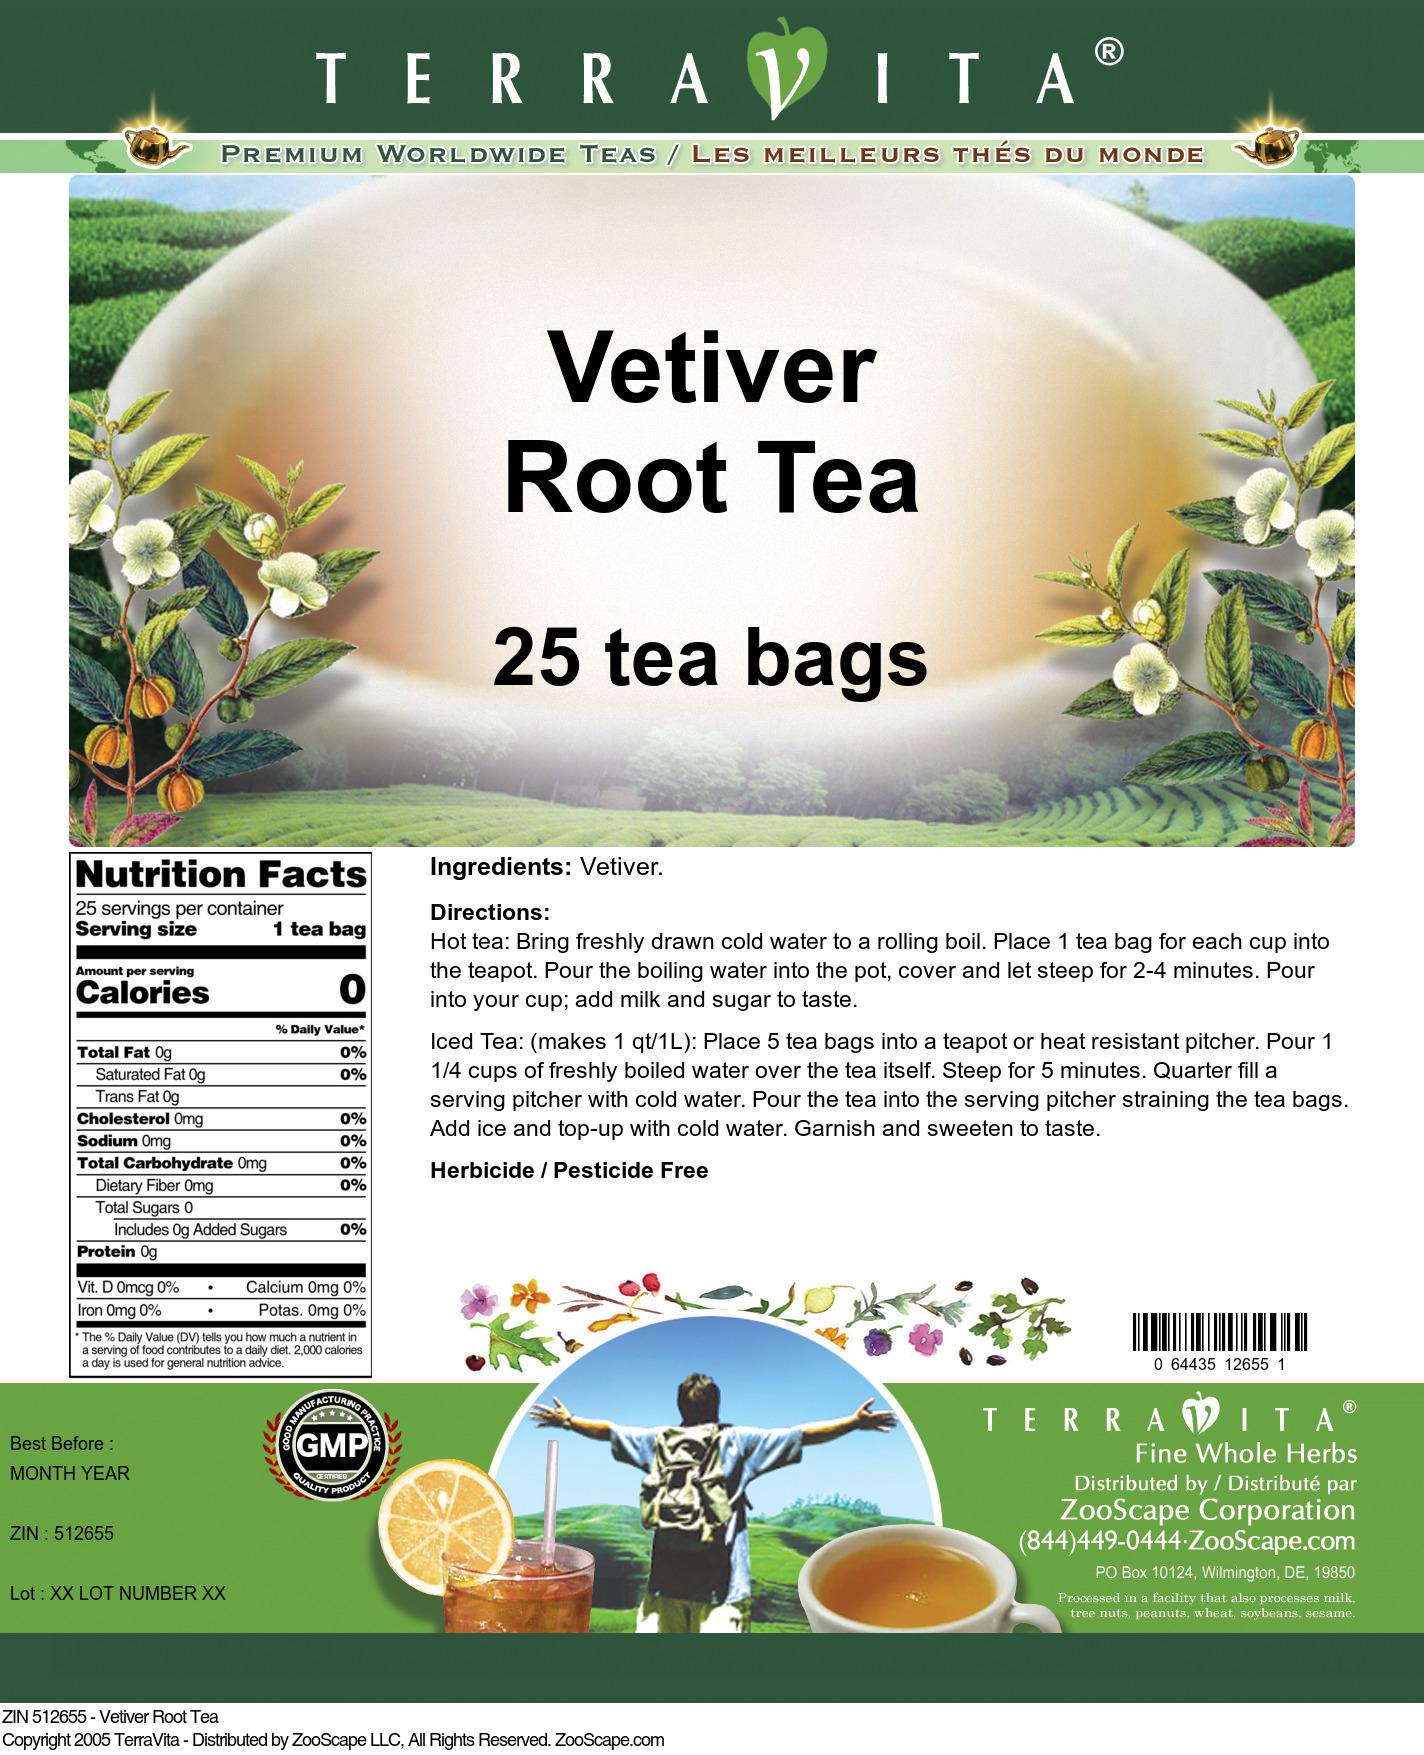 Vetiver Root Tea